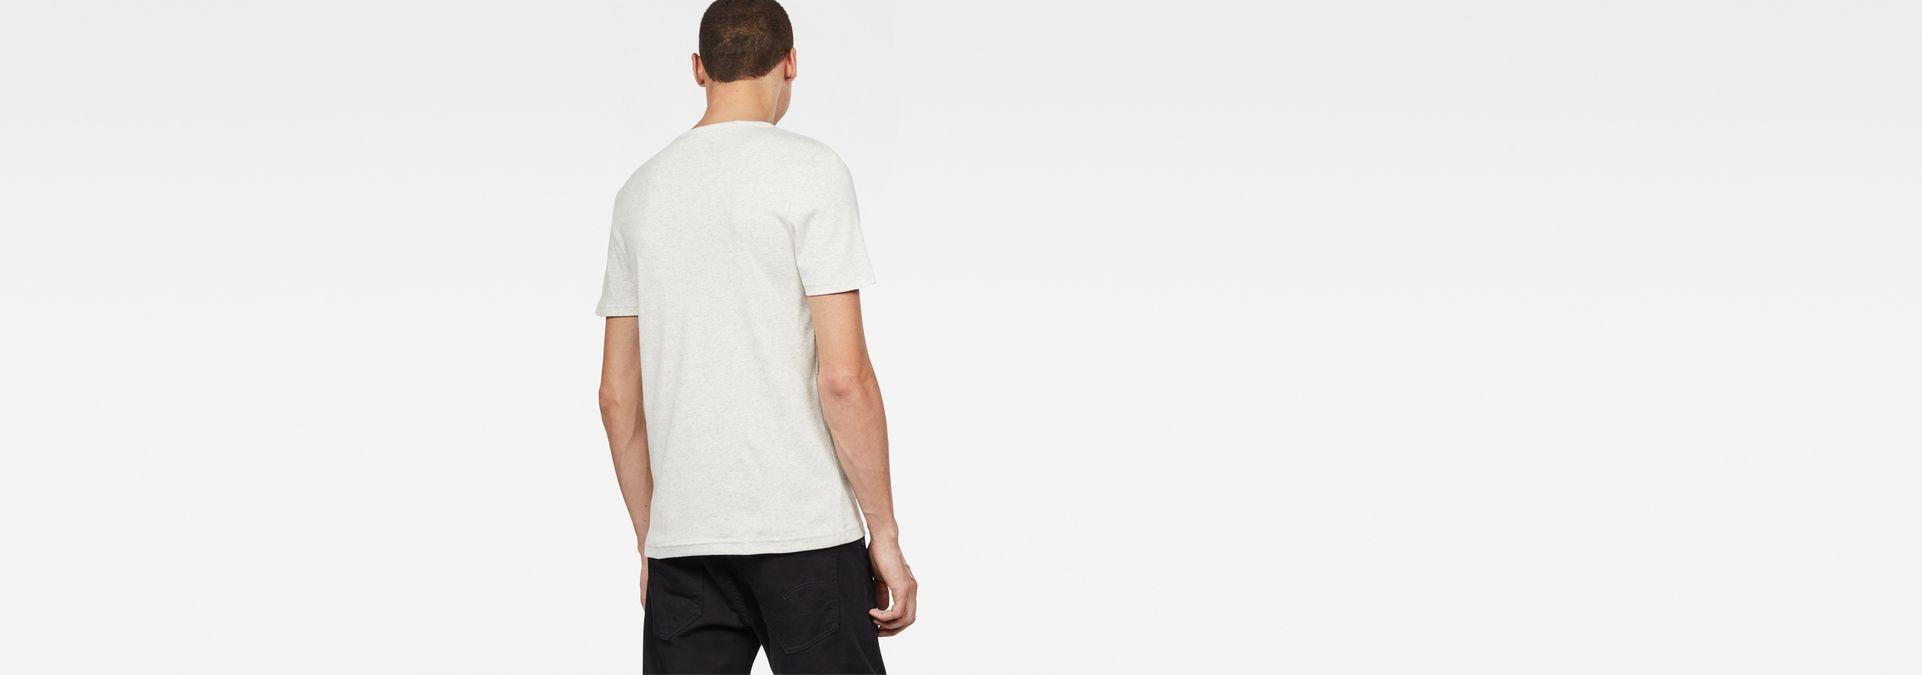 53ab59152866 ... G-Star RAW® Drillon T-Shirt White model back